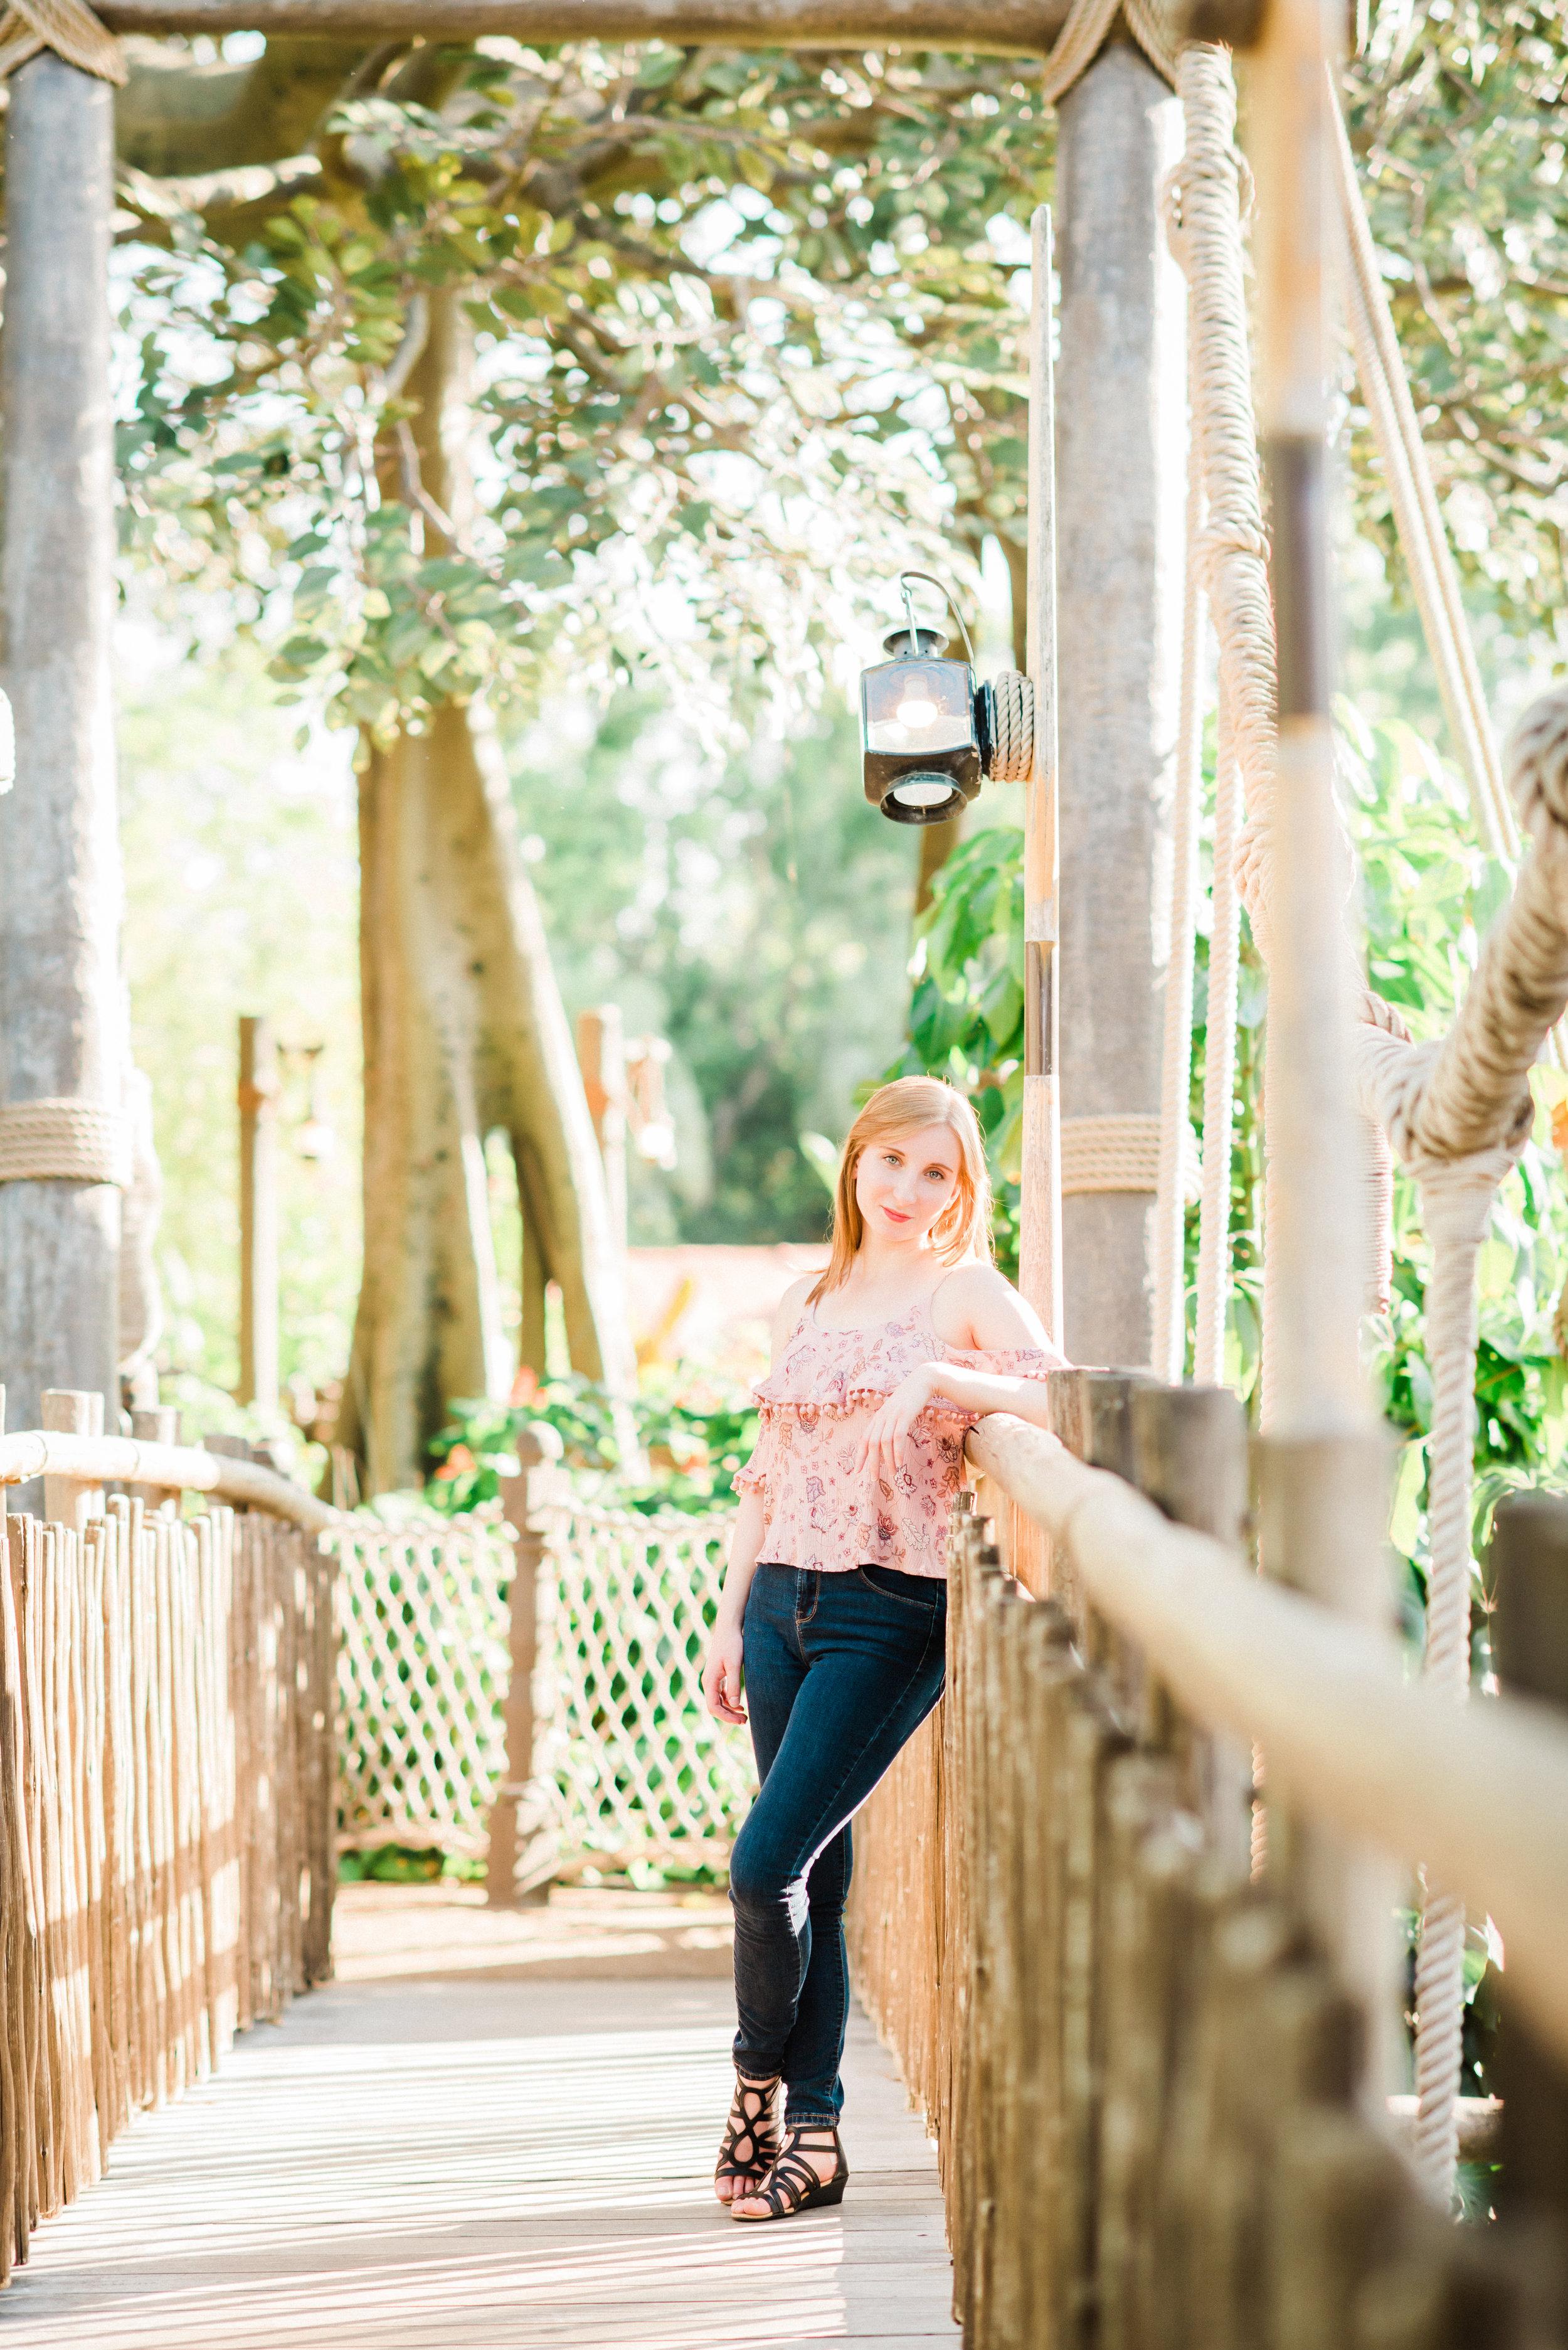 KateTaramykinStudios-Disney-World-Magic-Kingdom-Portraits-Jess-6.jpg